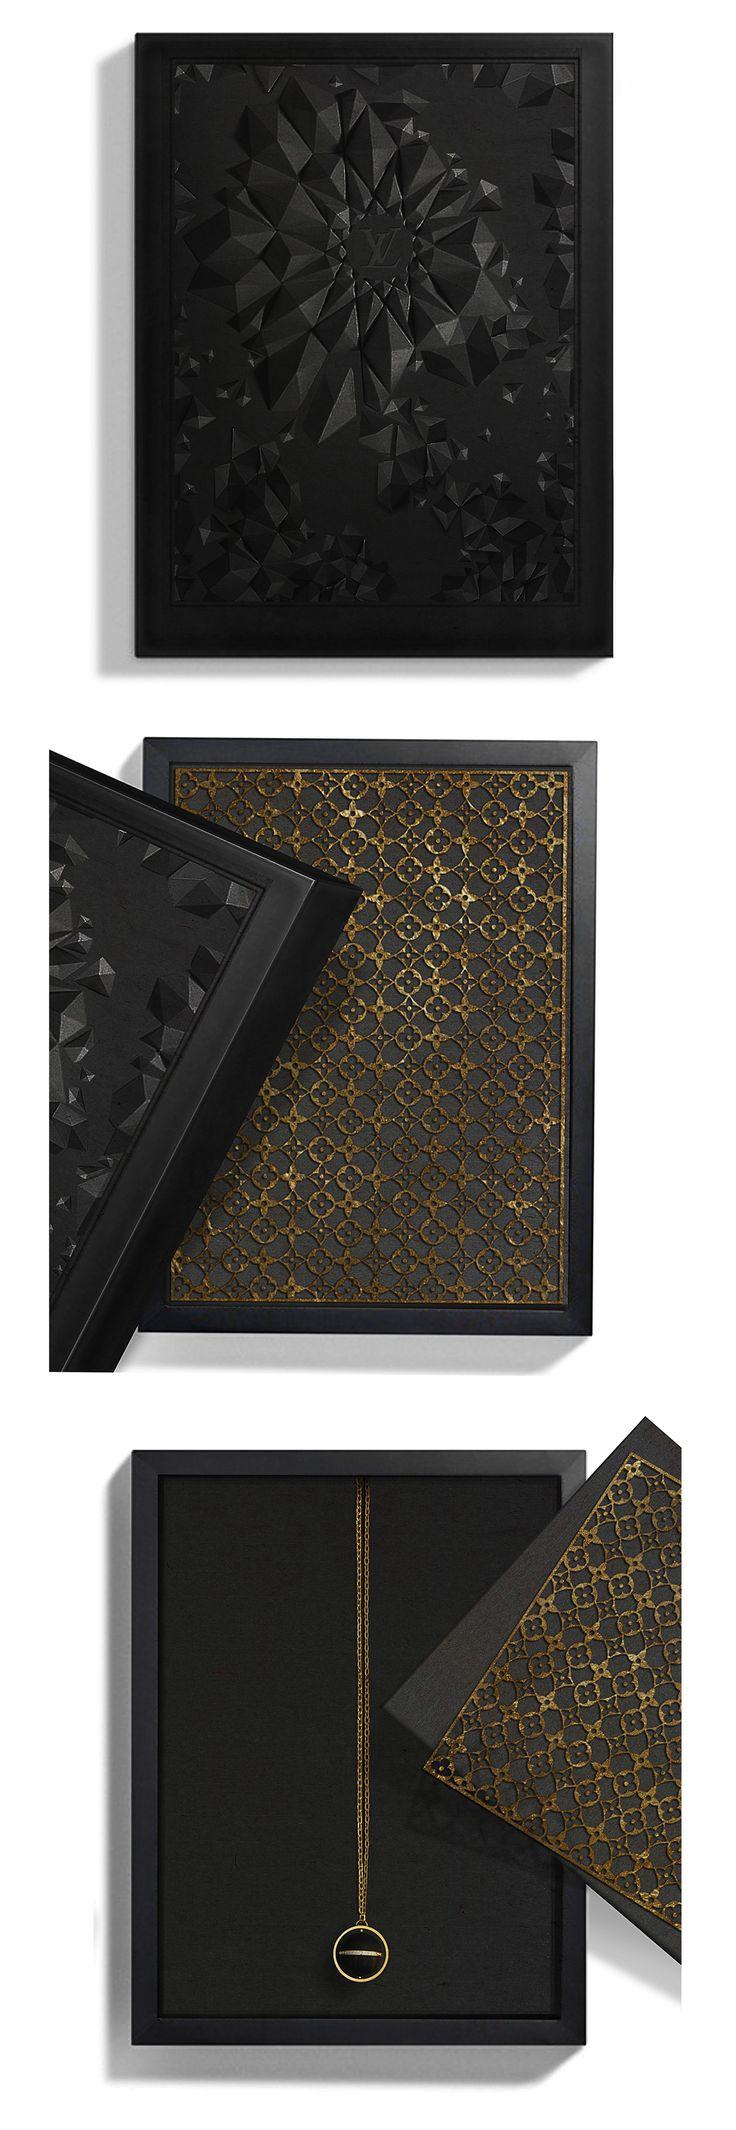 Louis Vuitton Packaging